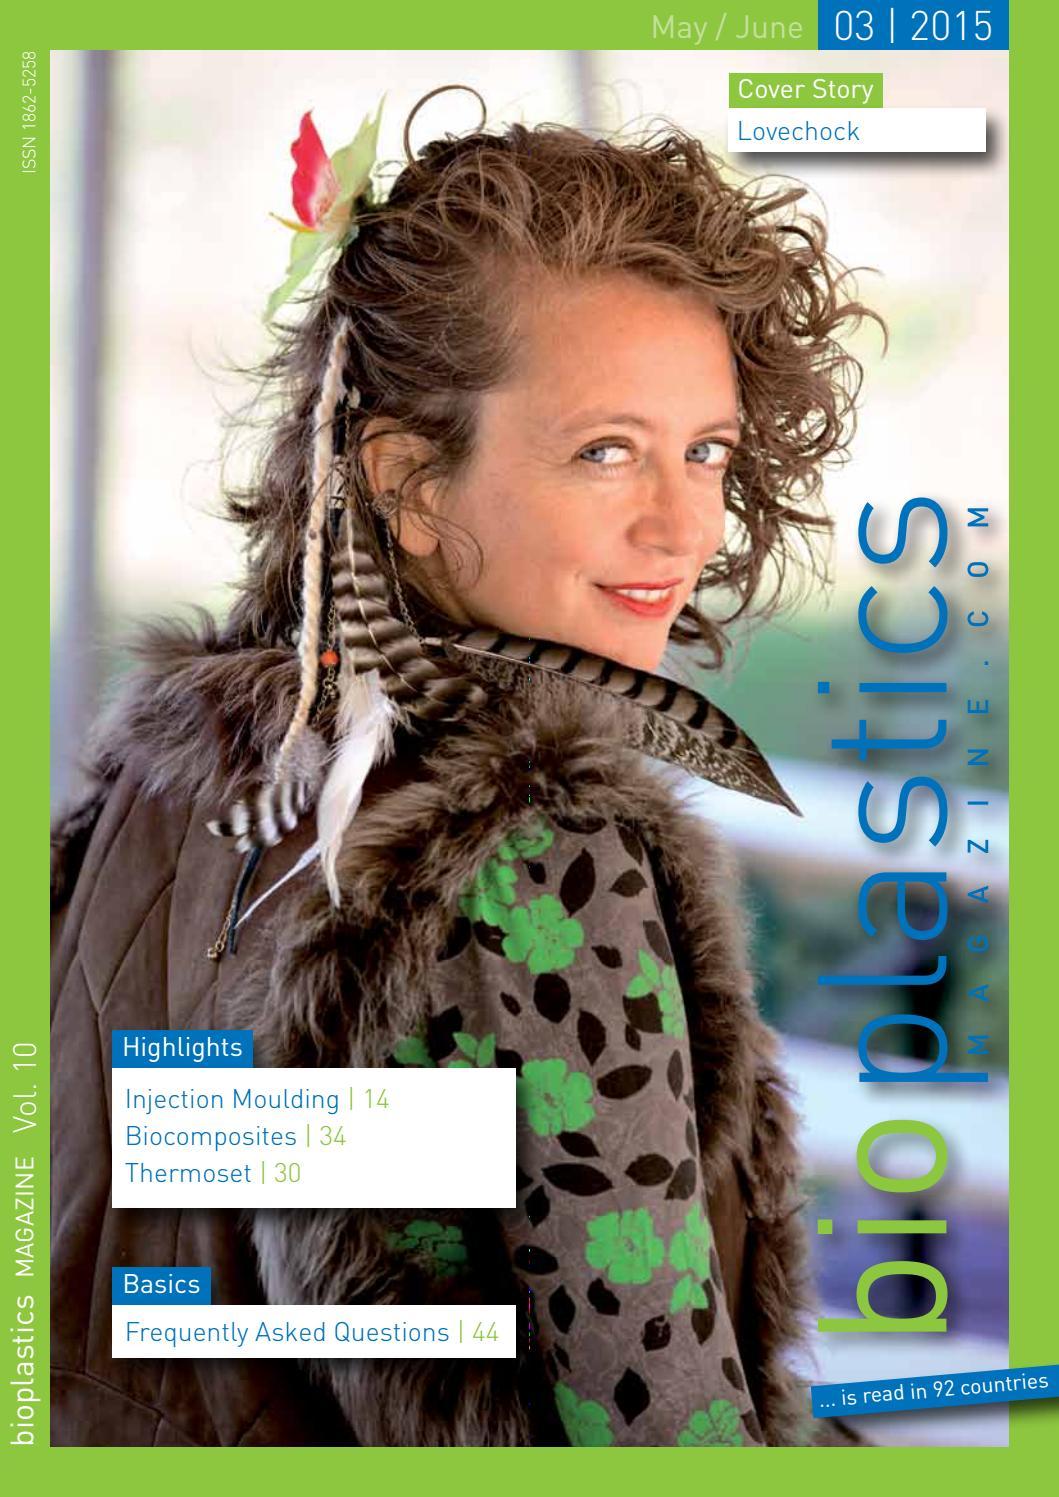 bioplastics MAGAZINE 03-2015 by bioplastics MAGAZINE - issuu